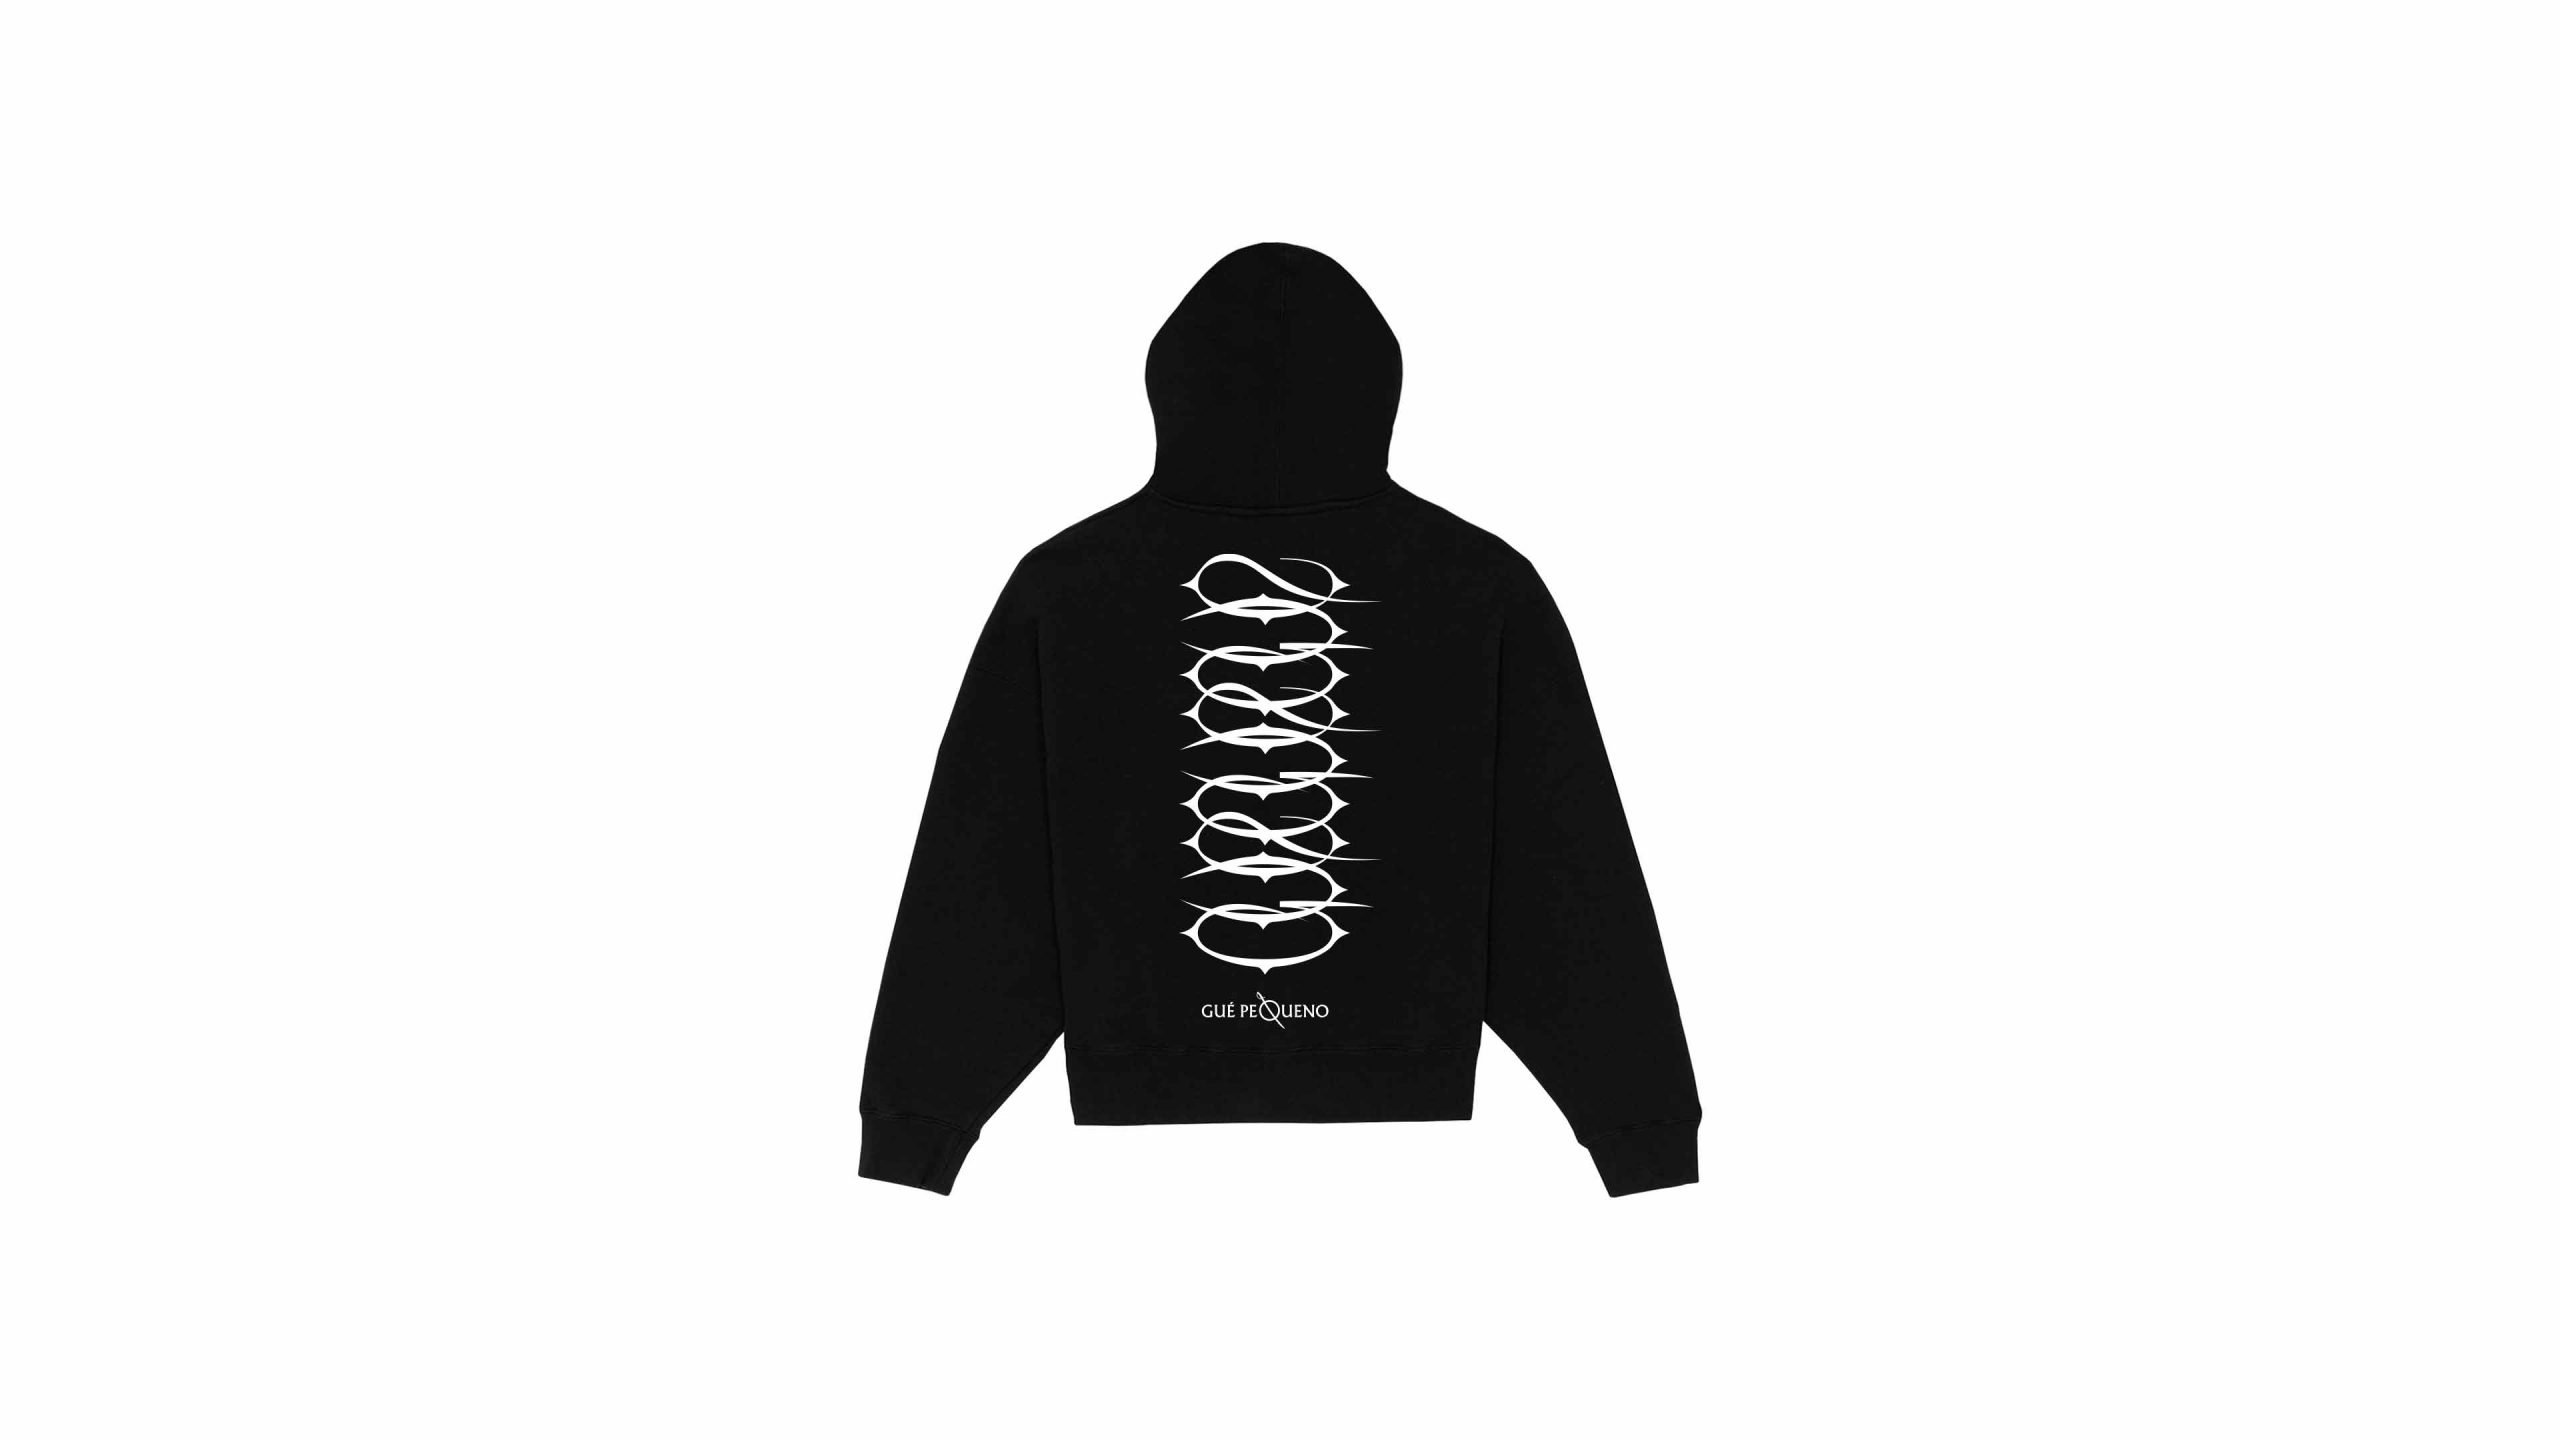 GUE-PEQUENO-SINATRA-merch-graphics-gue-hoodie-back